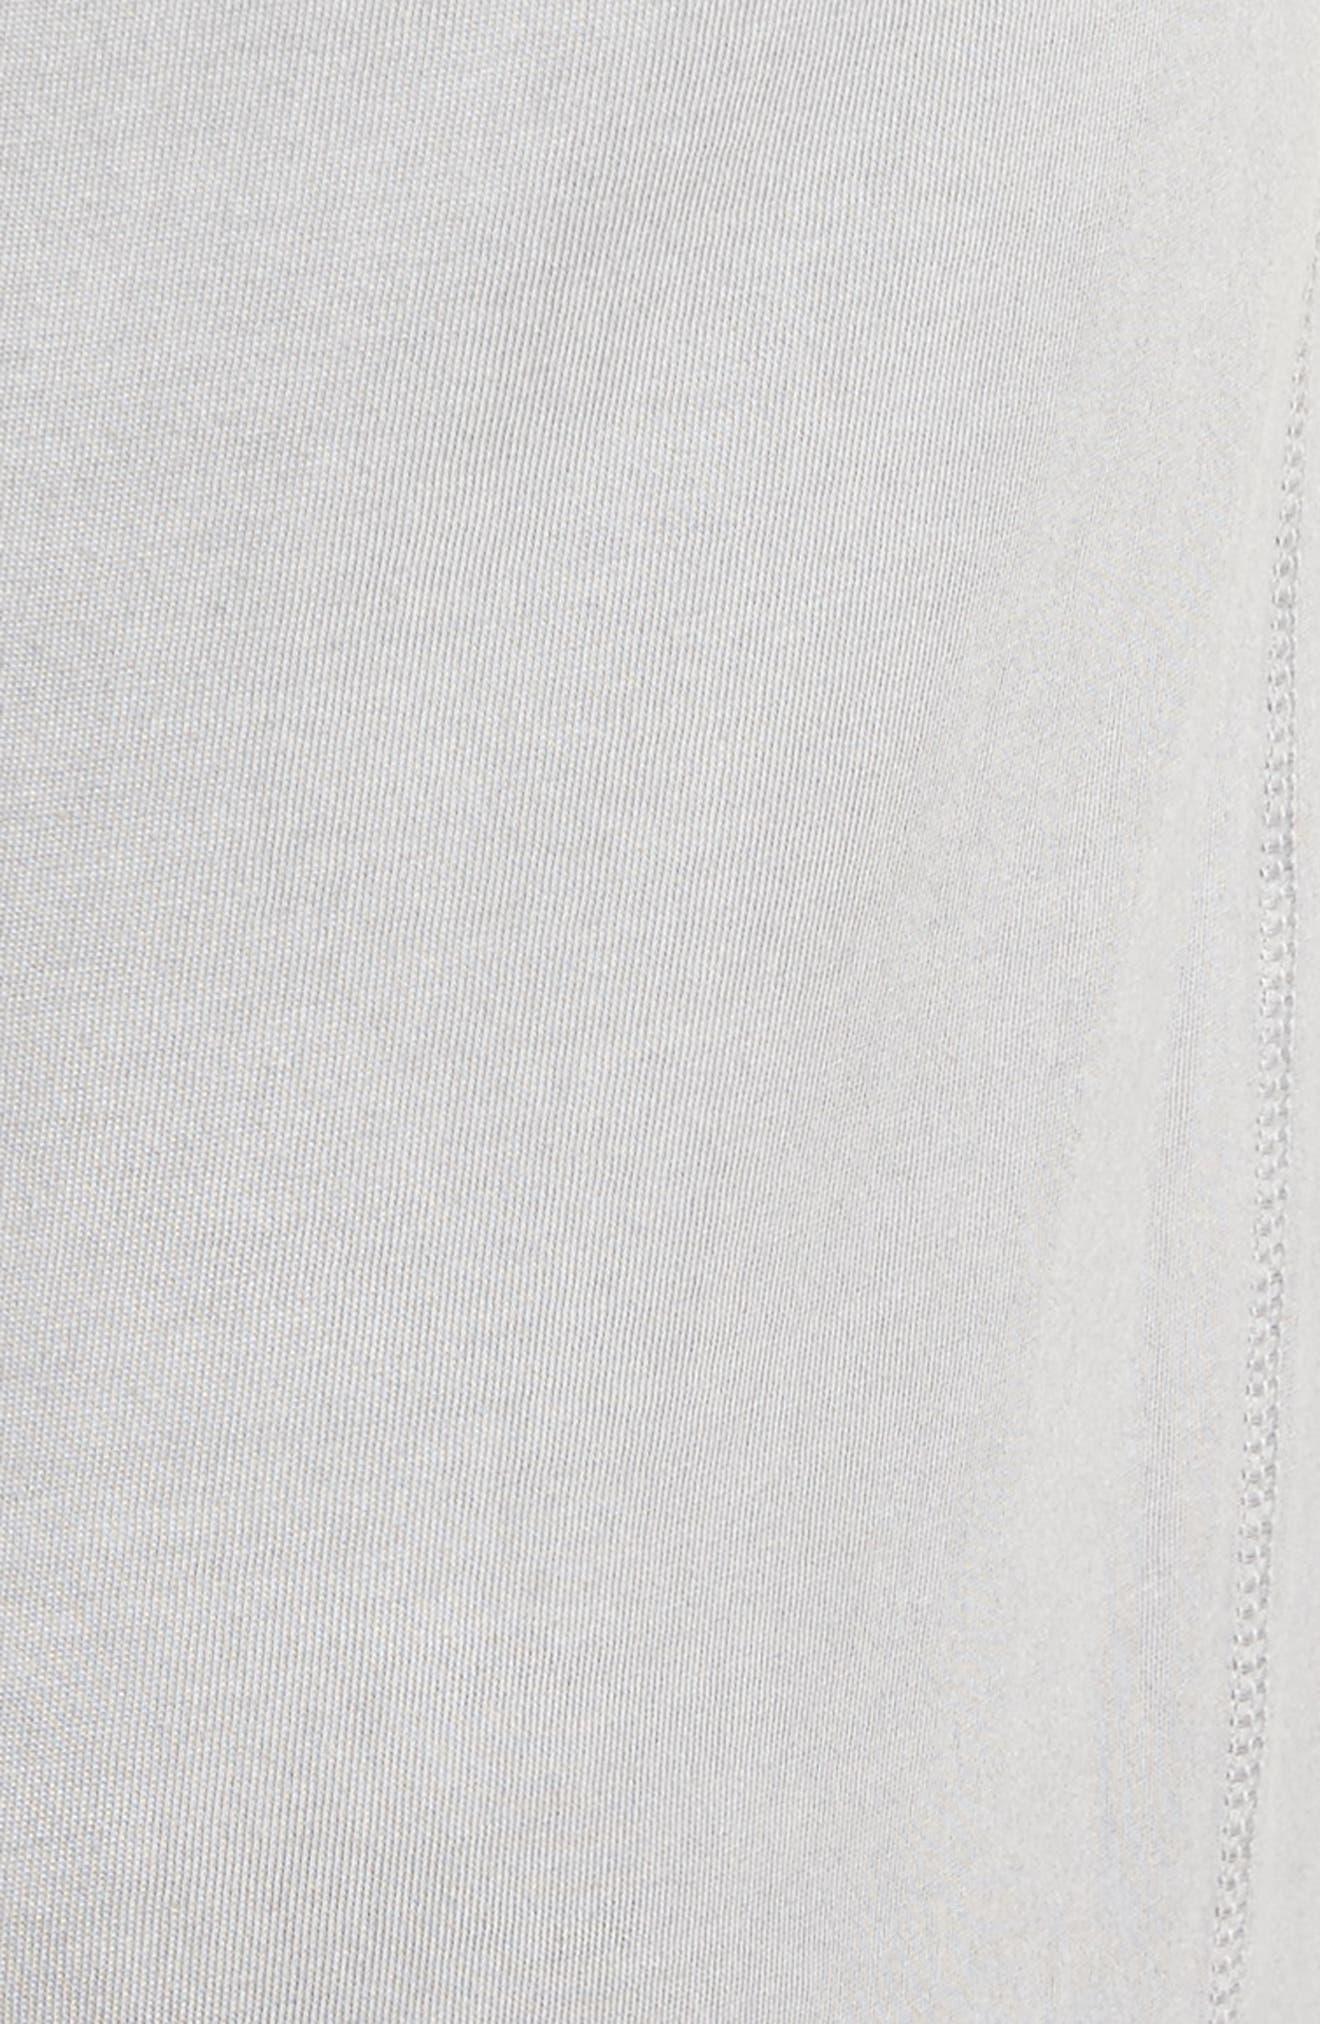 Peruvian Pima Cotton Lounge Pants,                             Alternate thumbnail 5, color,                             Grey